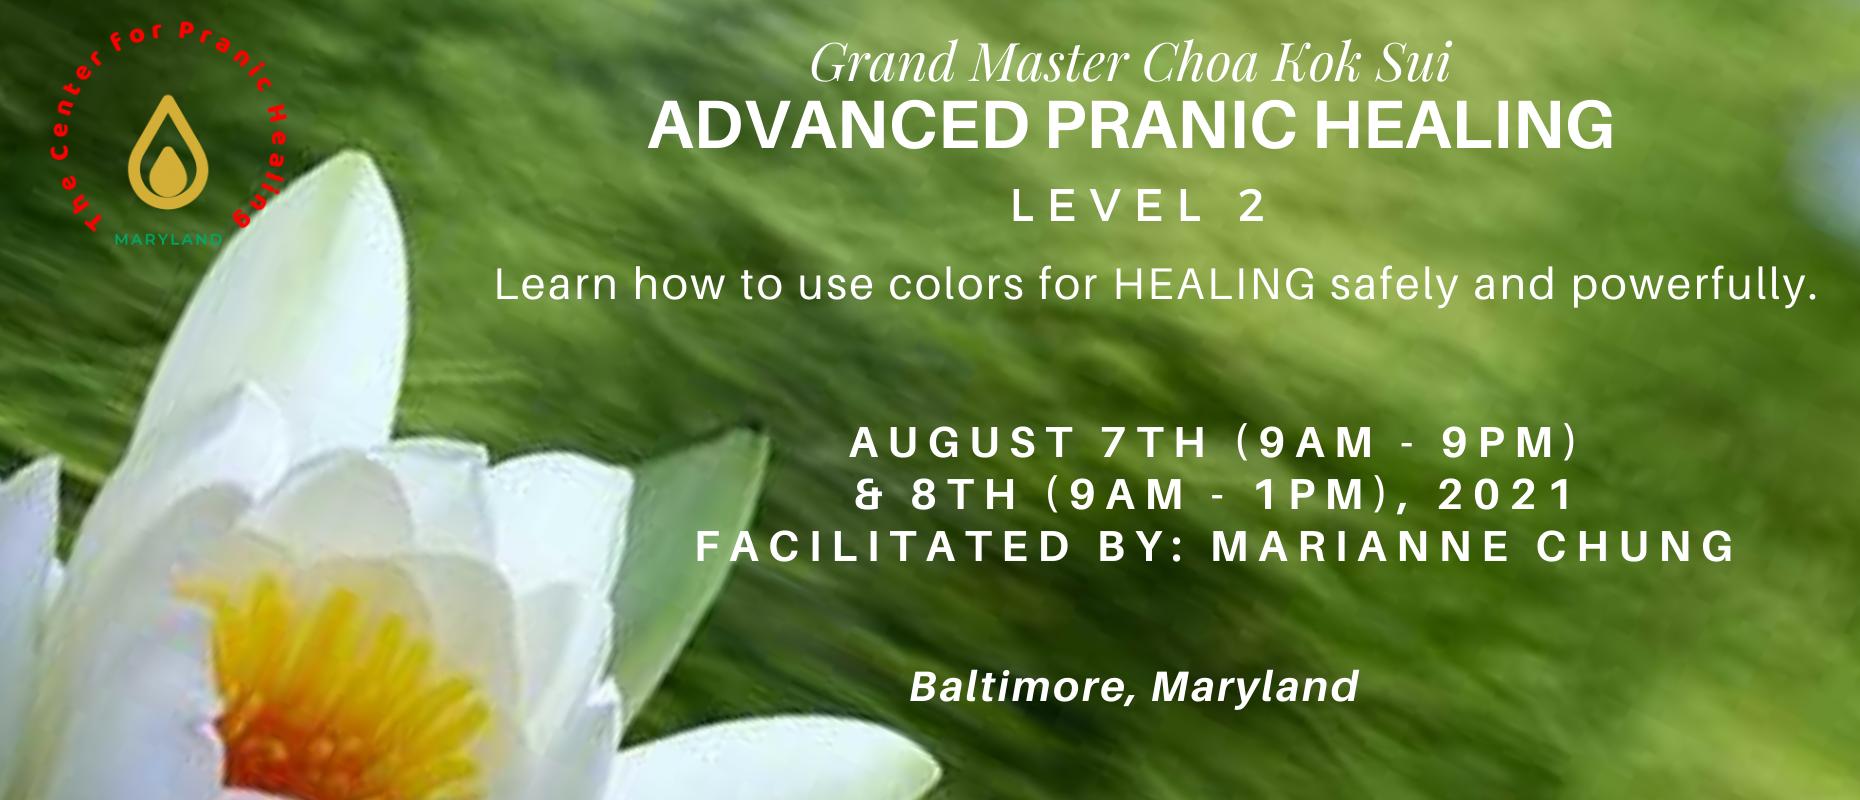 Pranic Healing Level 2 – Advanced Course